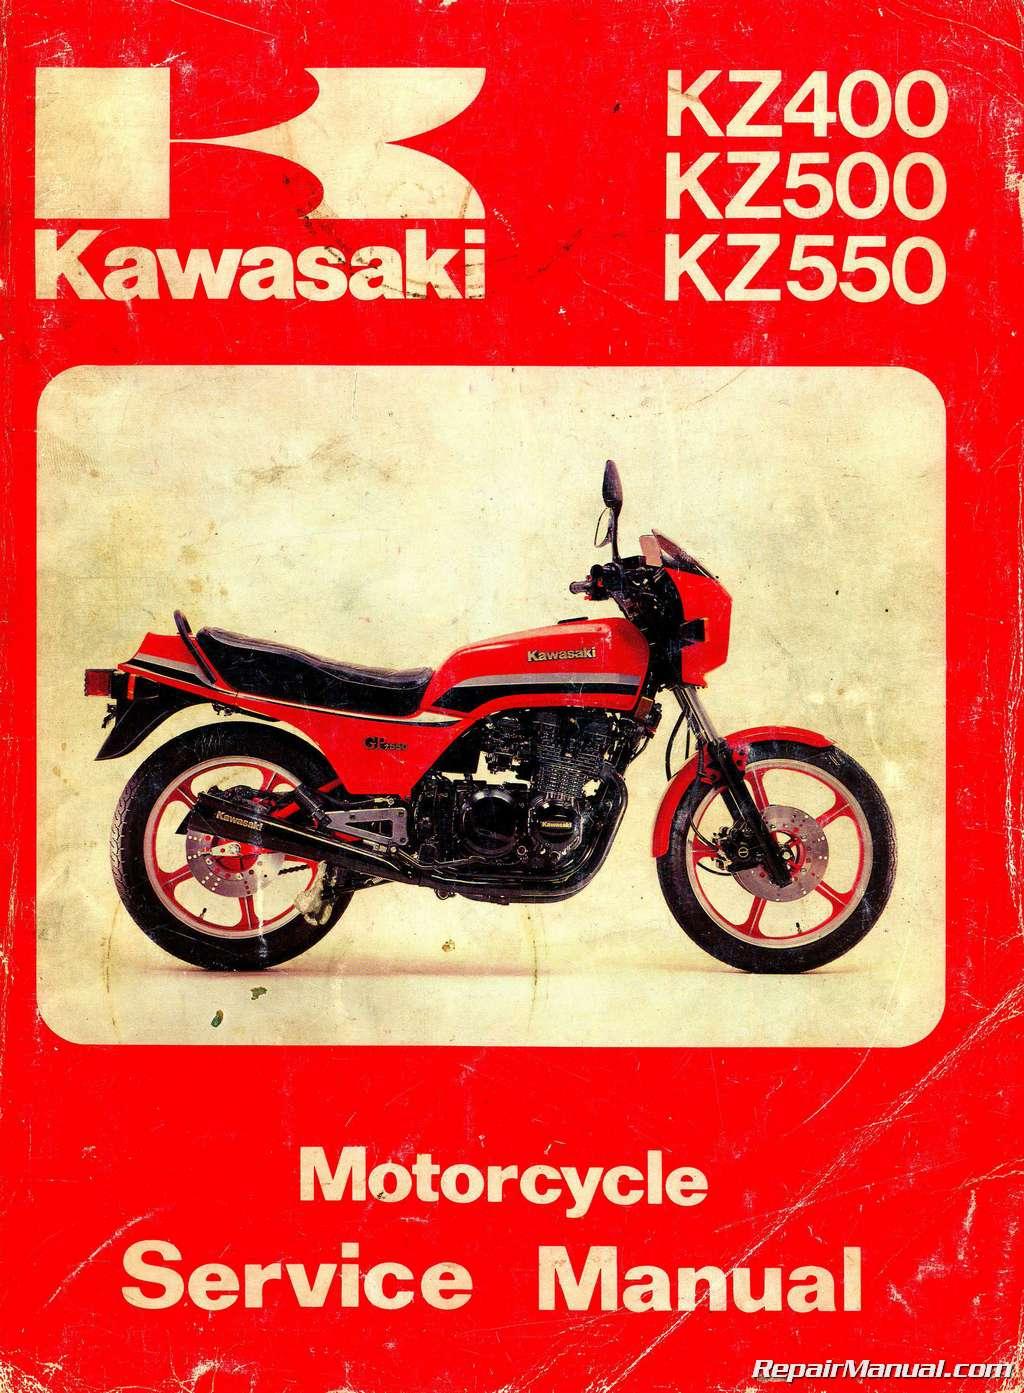 hight resolution of kawasaki kz400 kz500 kz550